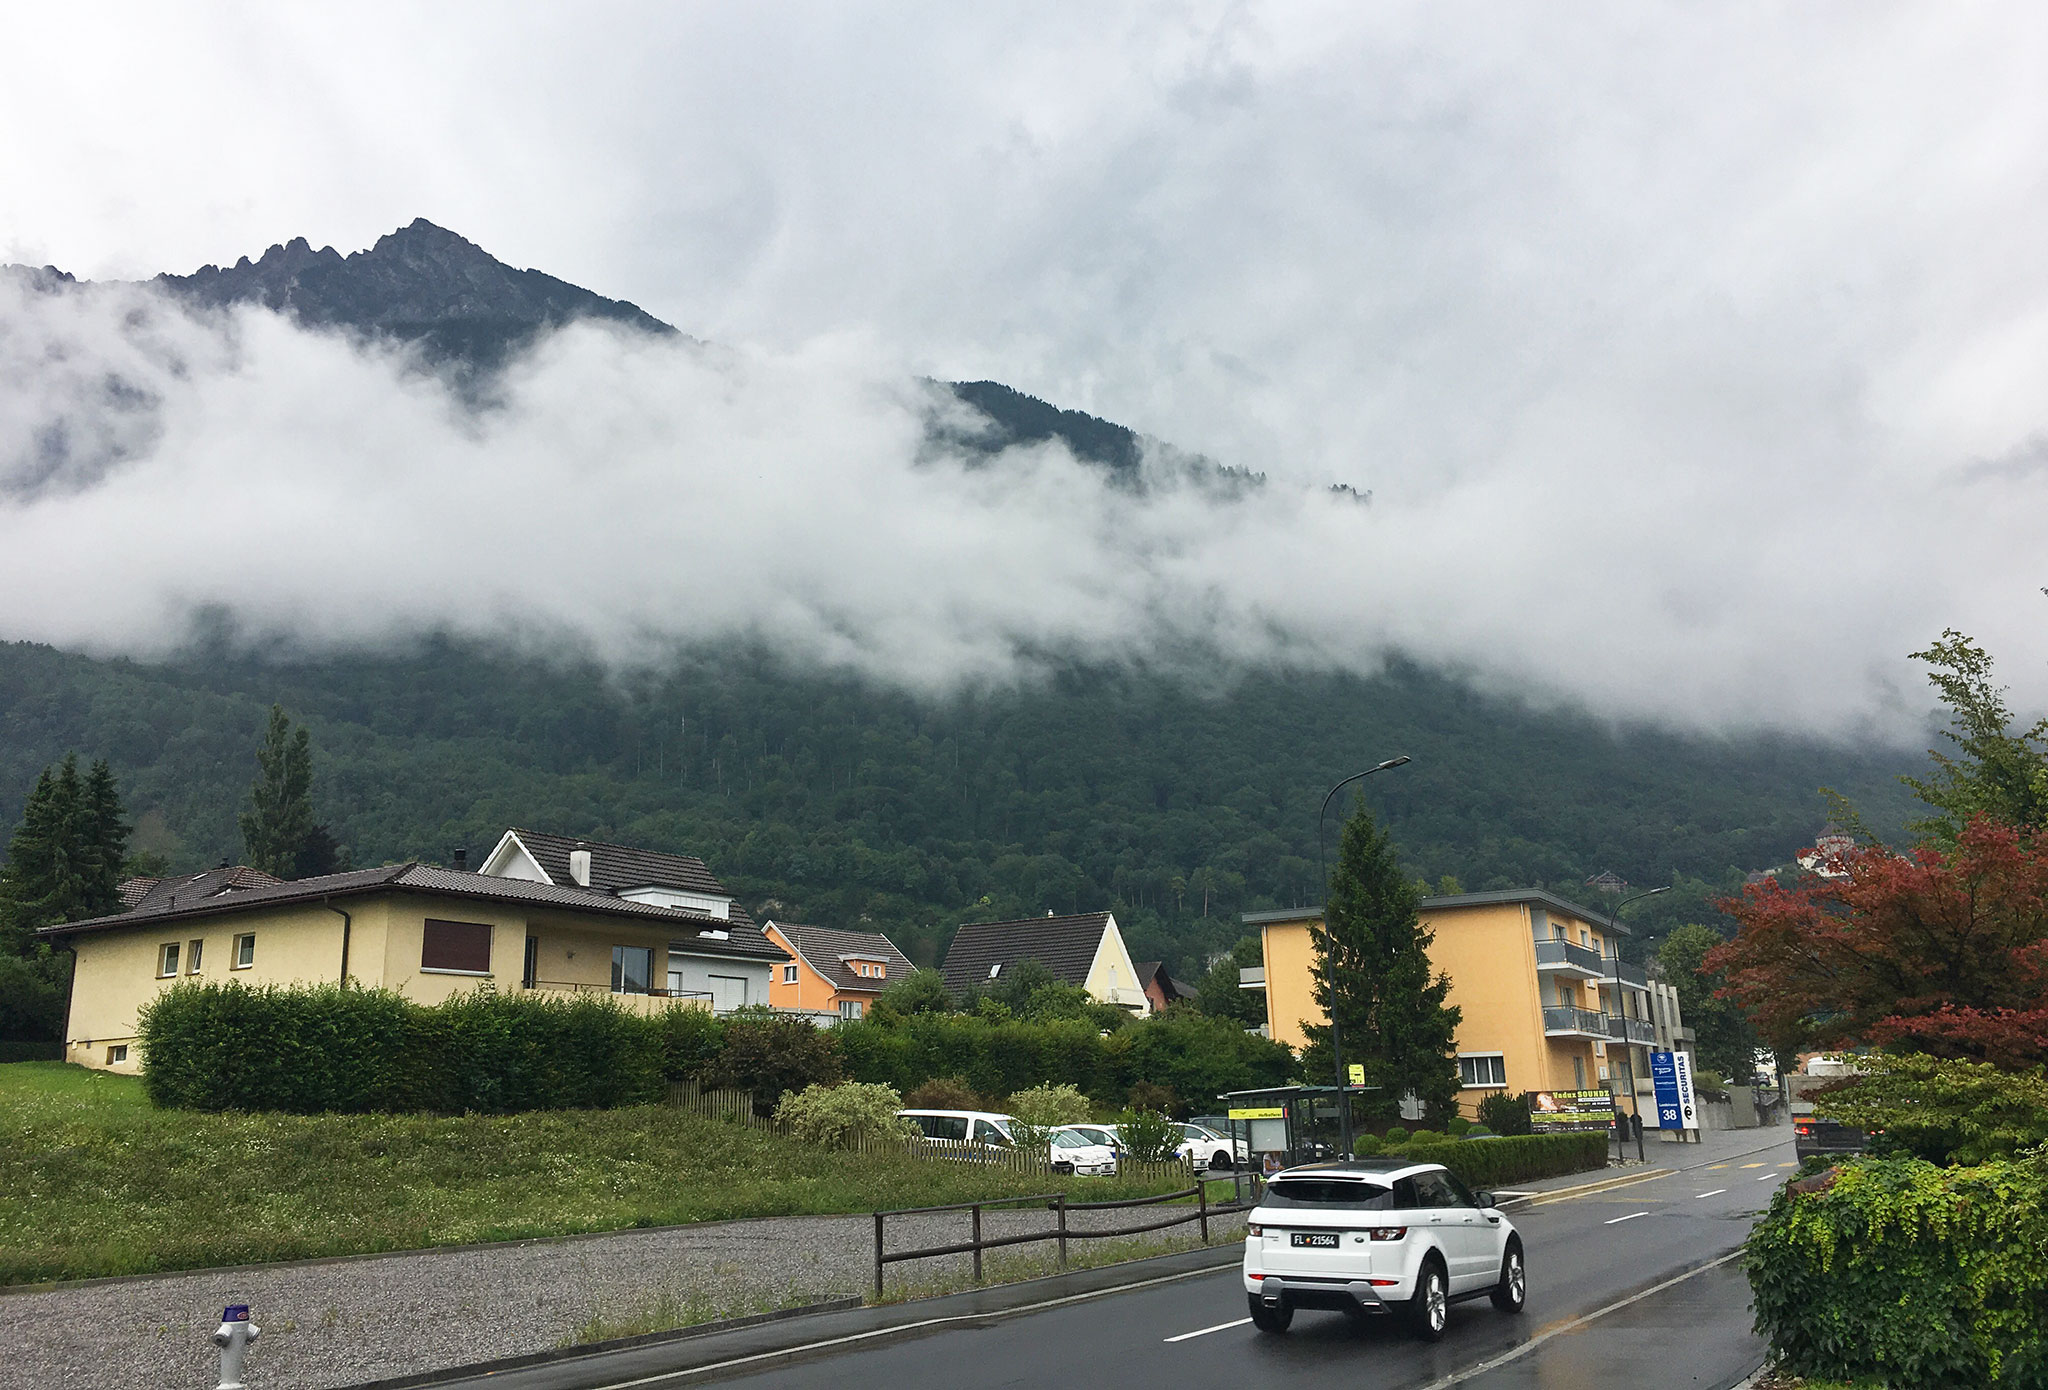 Right behind those houses. Liechtenstein and Vaduz ends